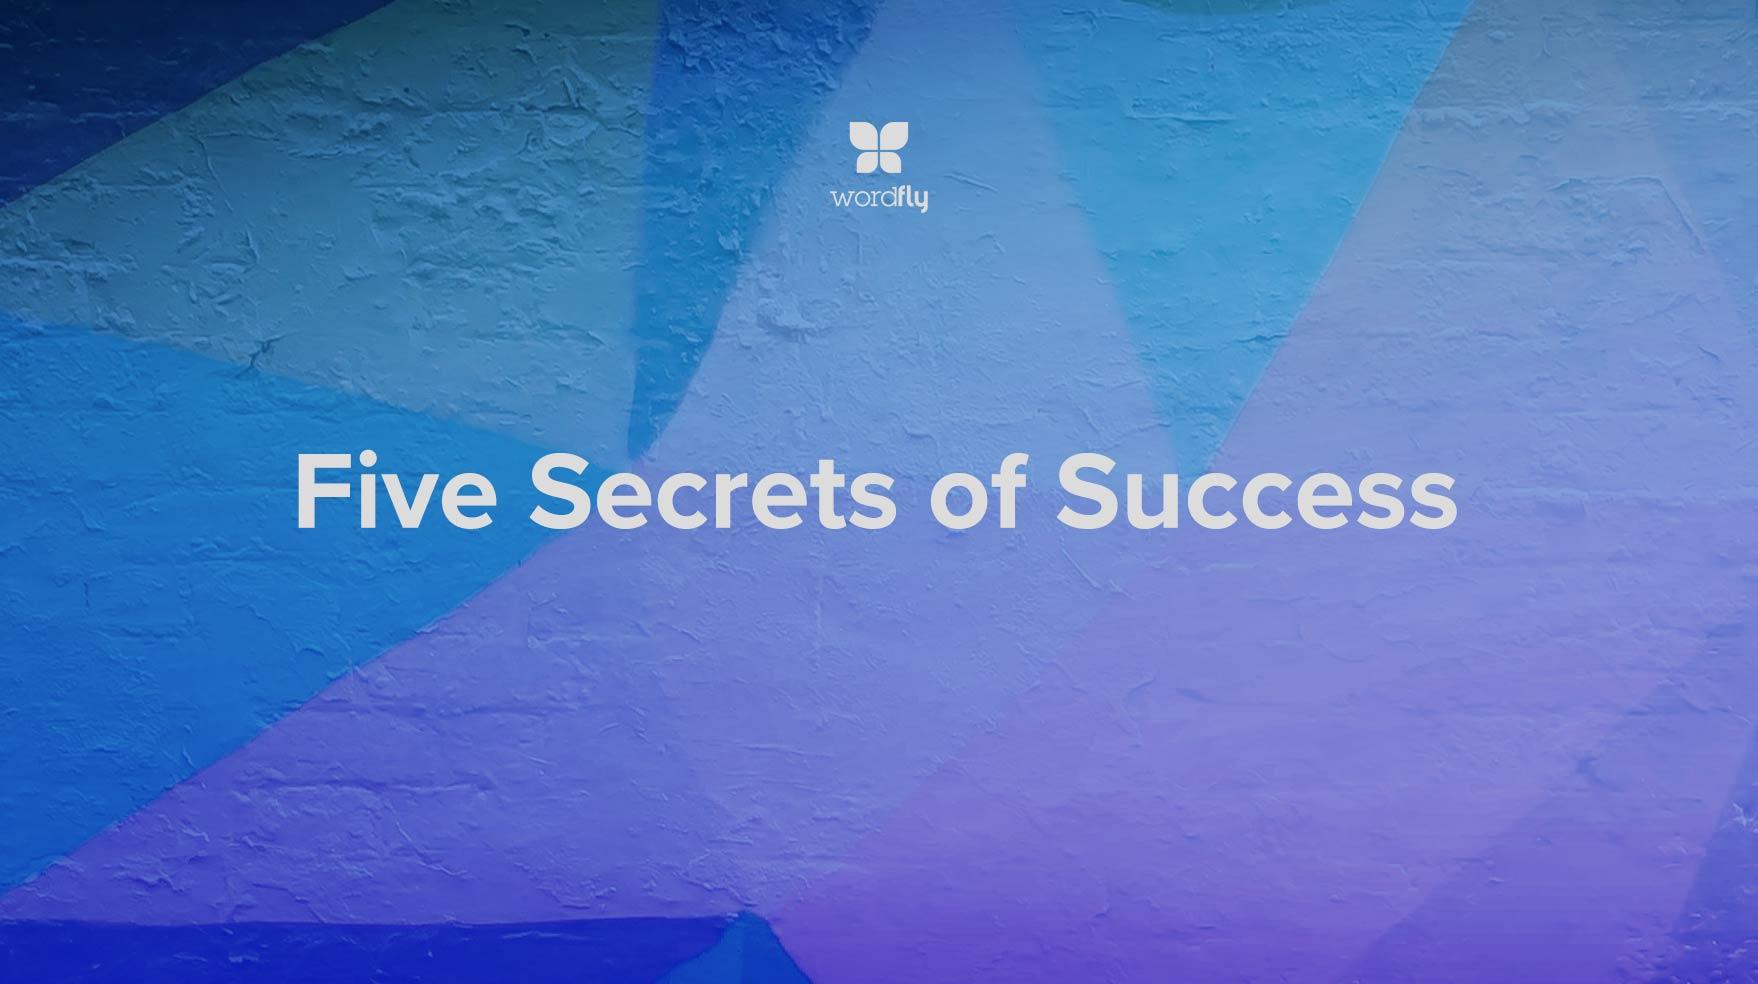 Five Secrets of Success